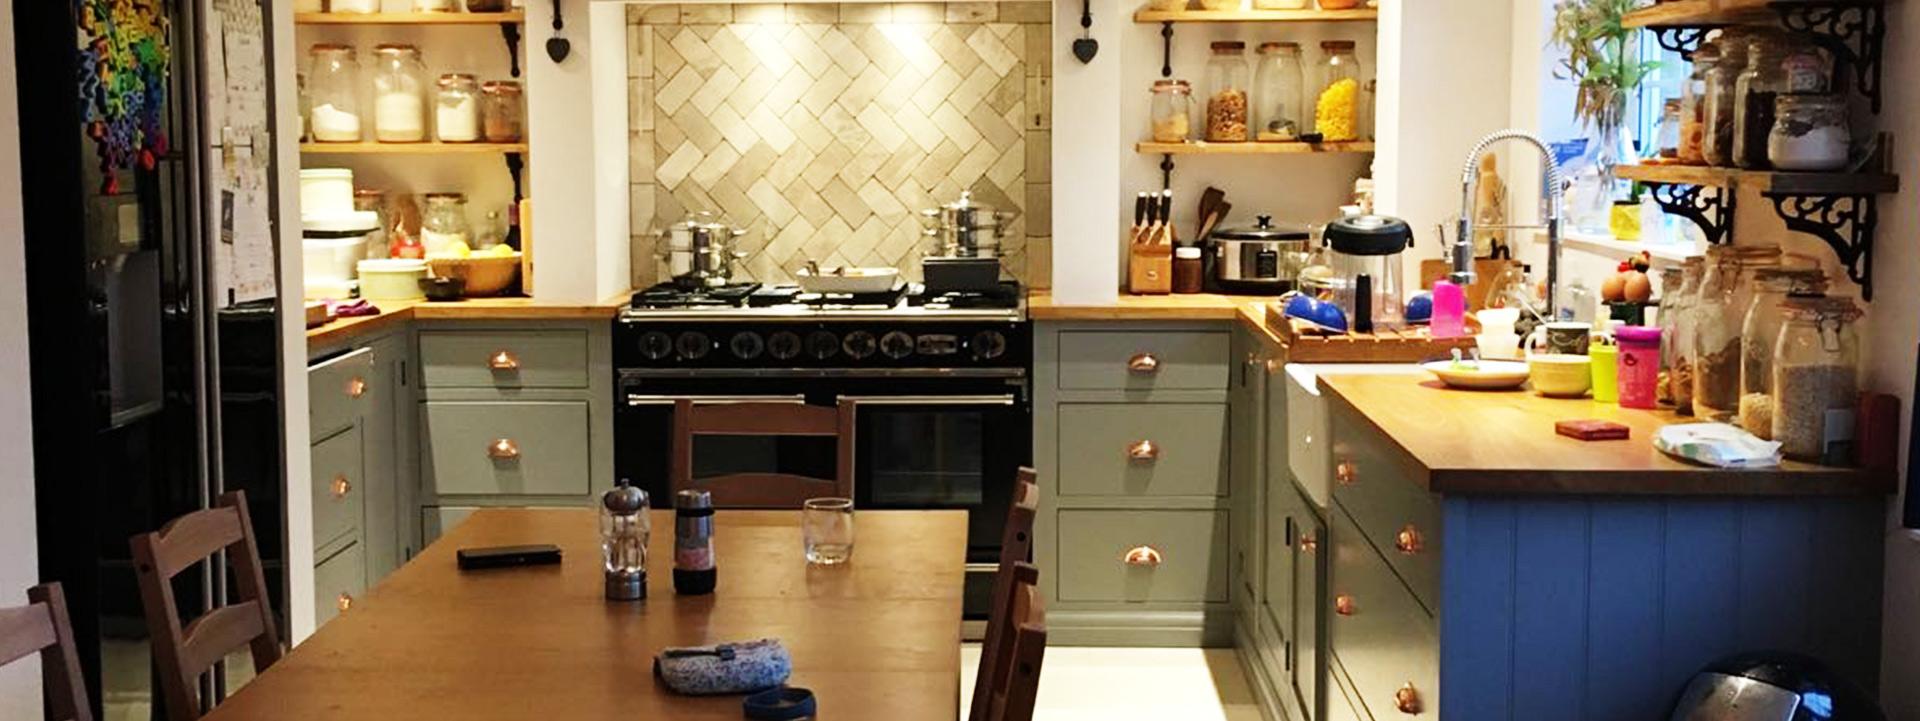 Fine kitchens built in Bedford